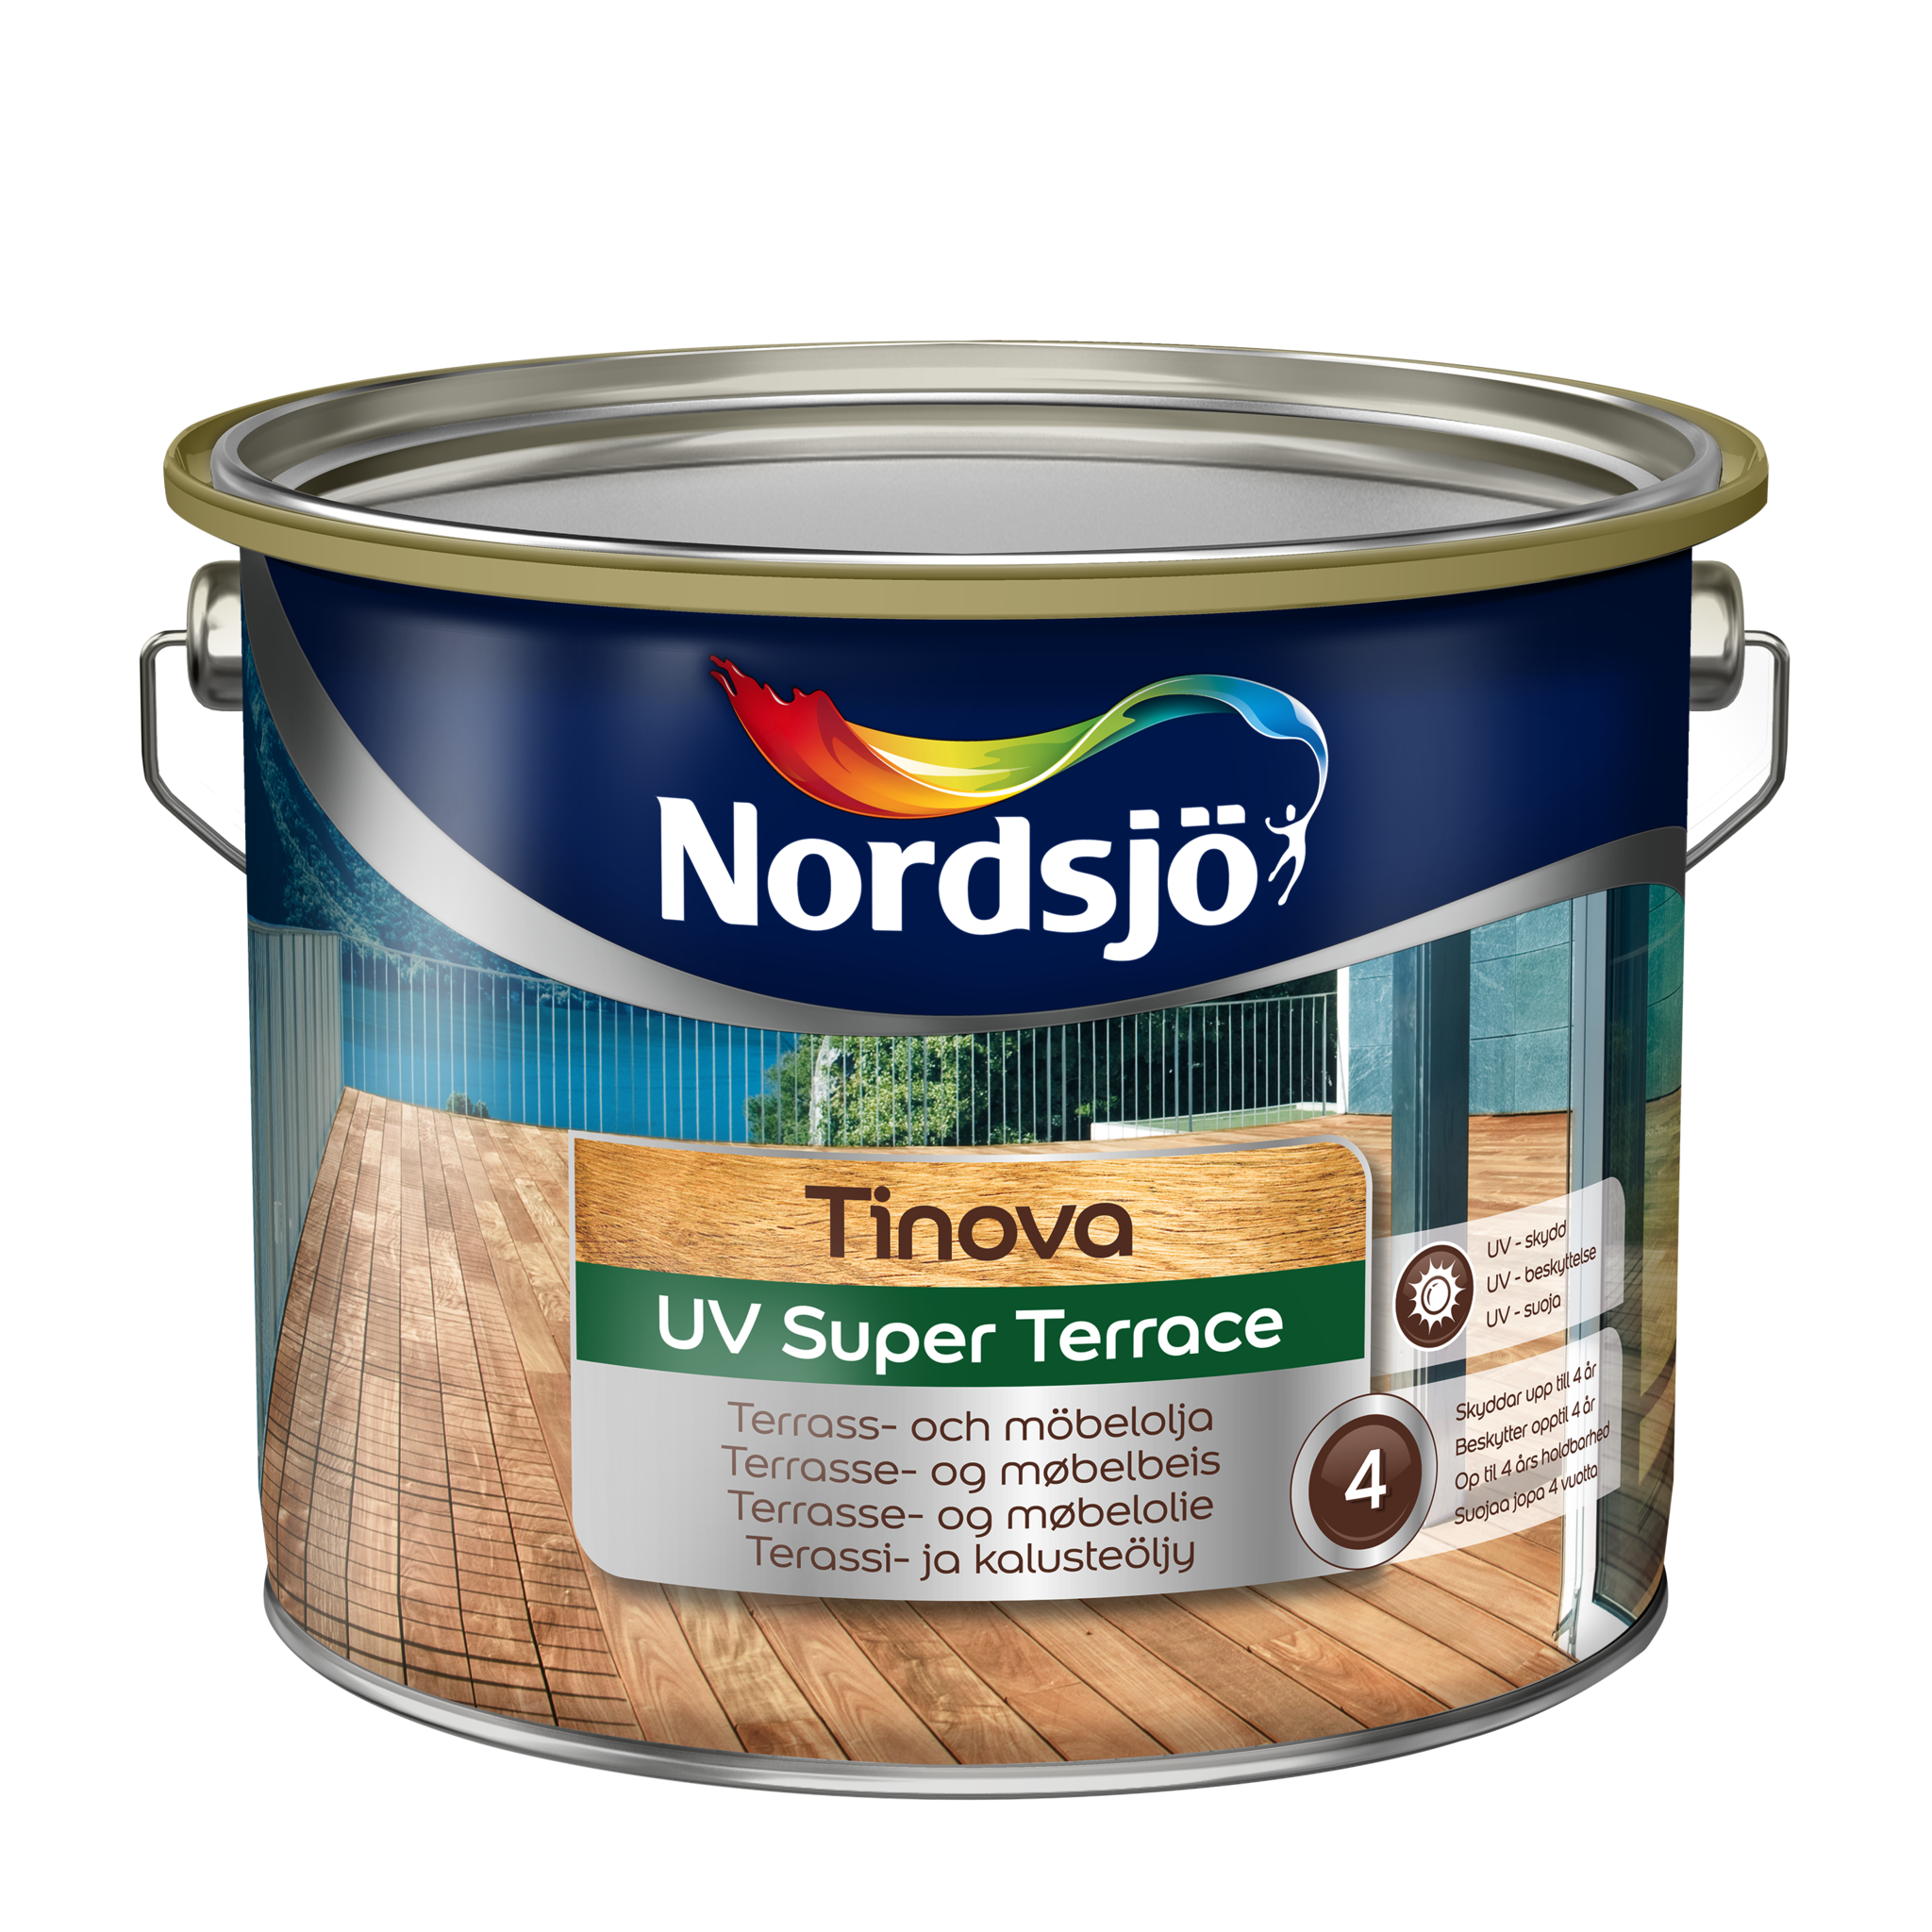 Nordsjö Tinova UV Super Terrace